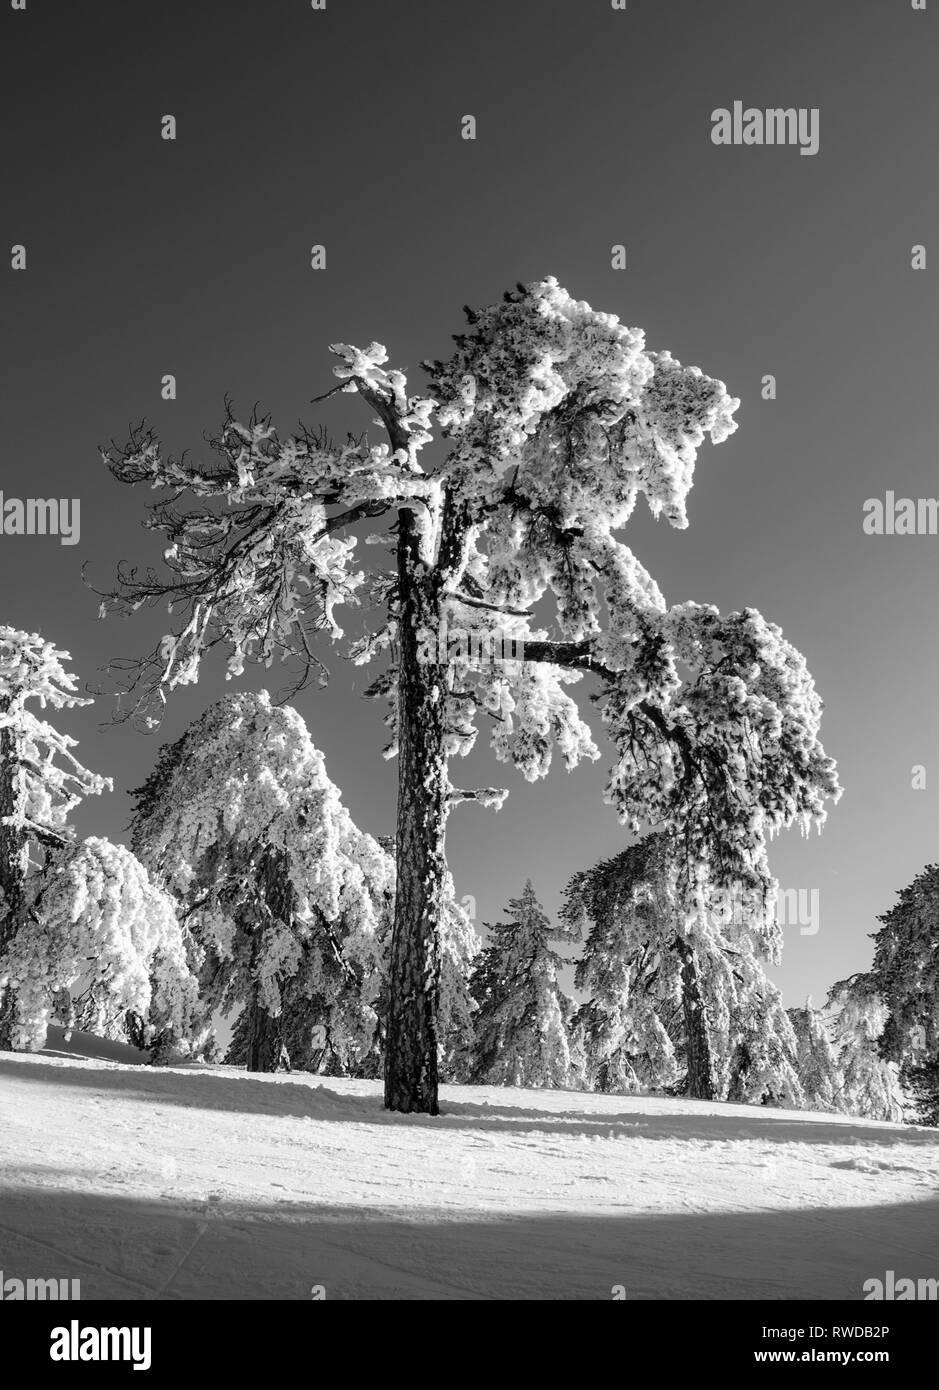 Snow fall at Olympos at Troodos, Cyprus - Stock Image